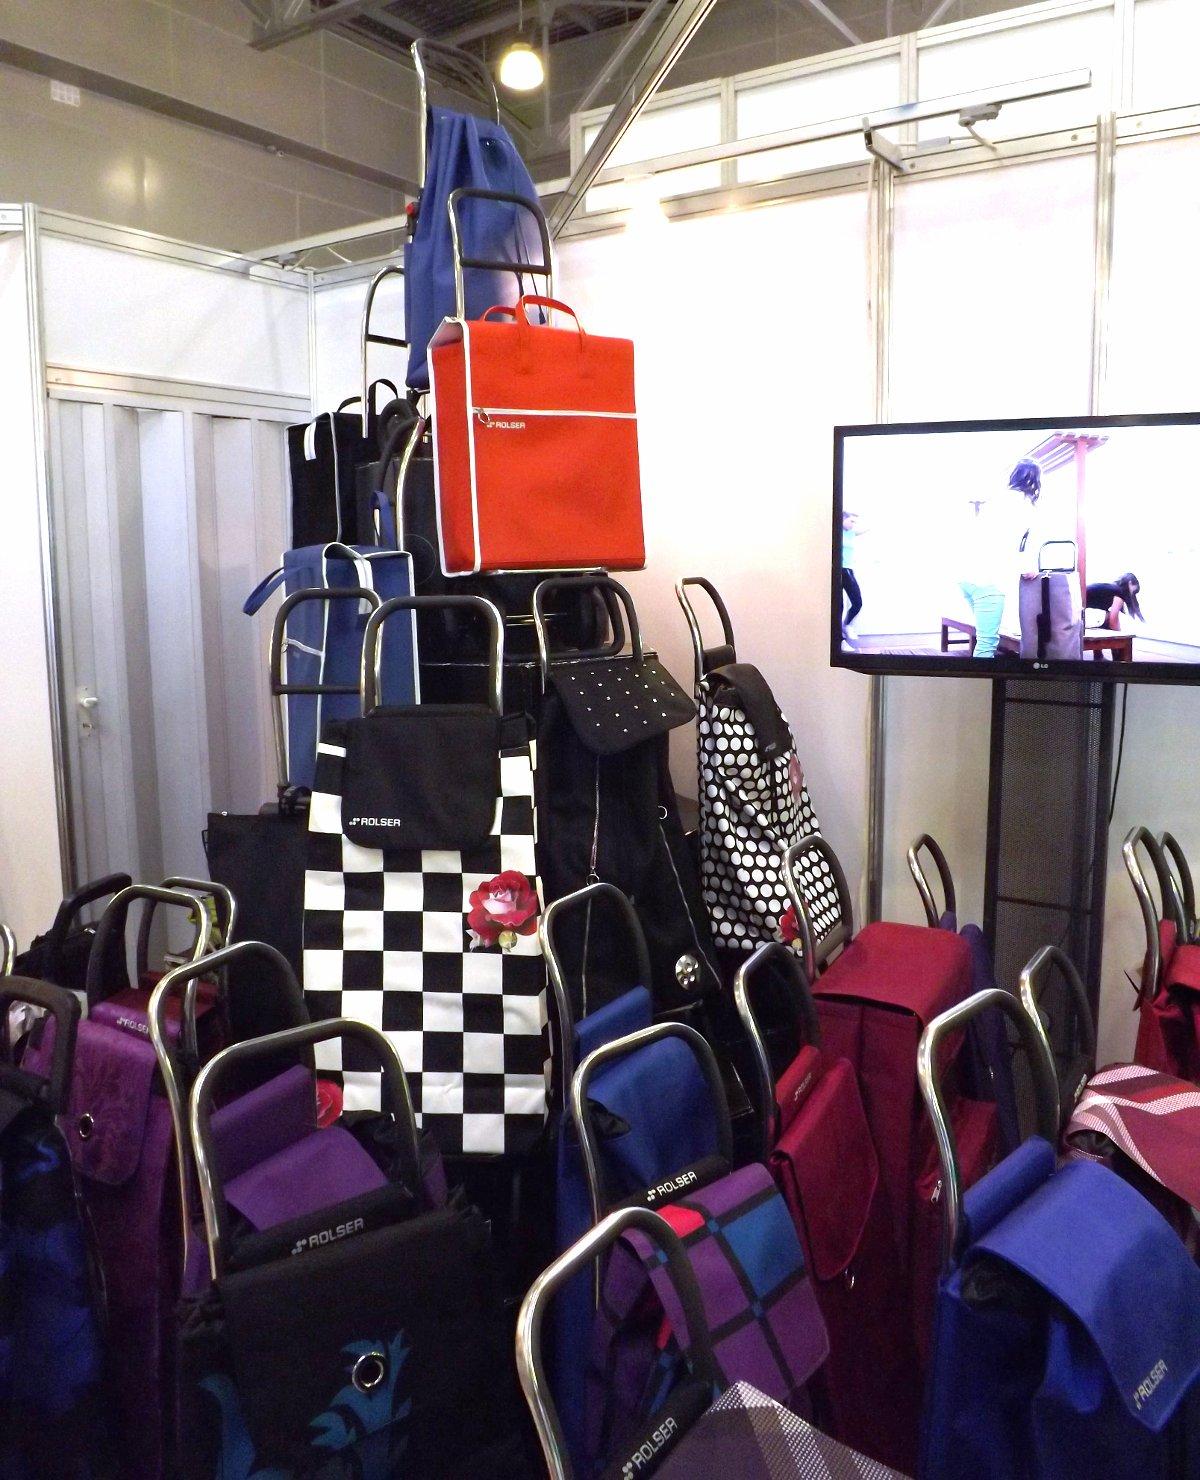 Сумки-тележки на экспозиции бренда Rolser во время выставки HouseHoldExpo 2015